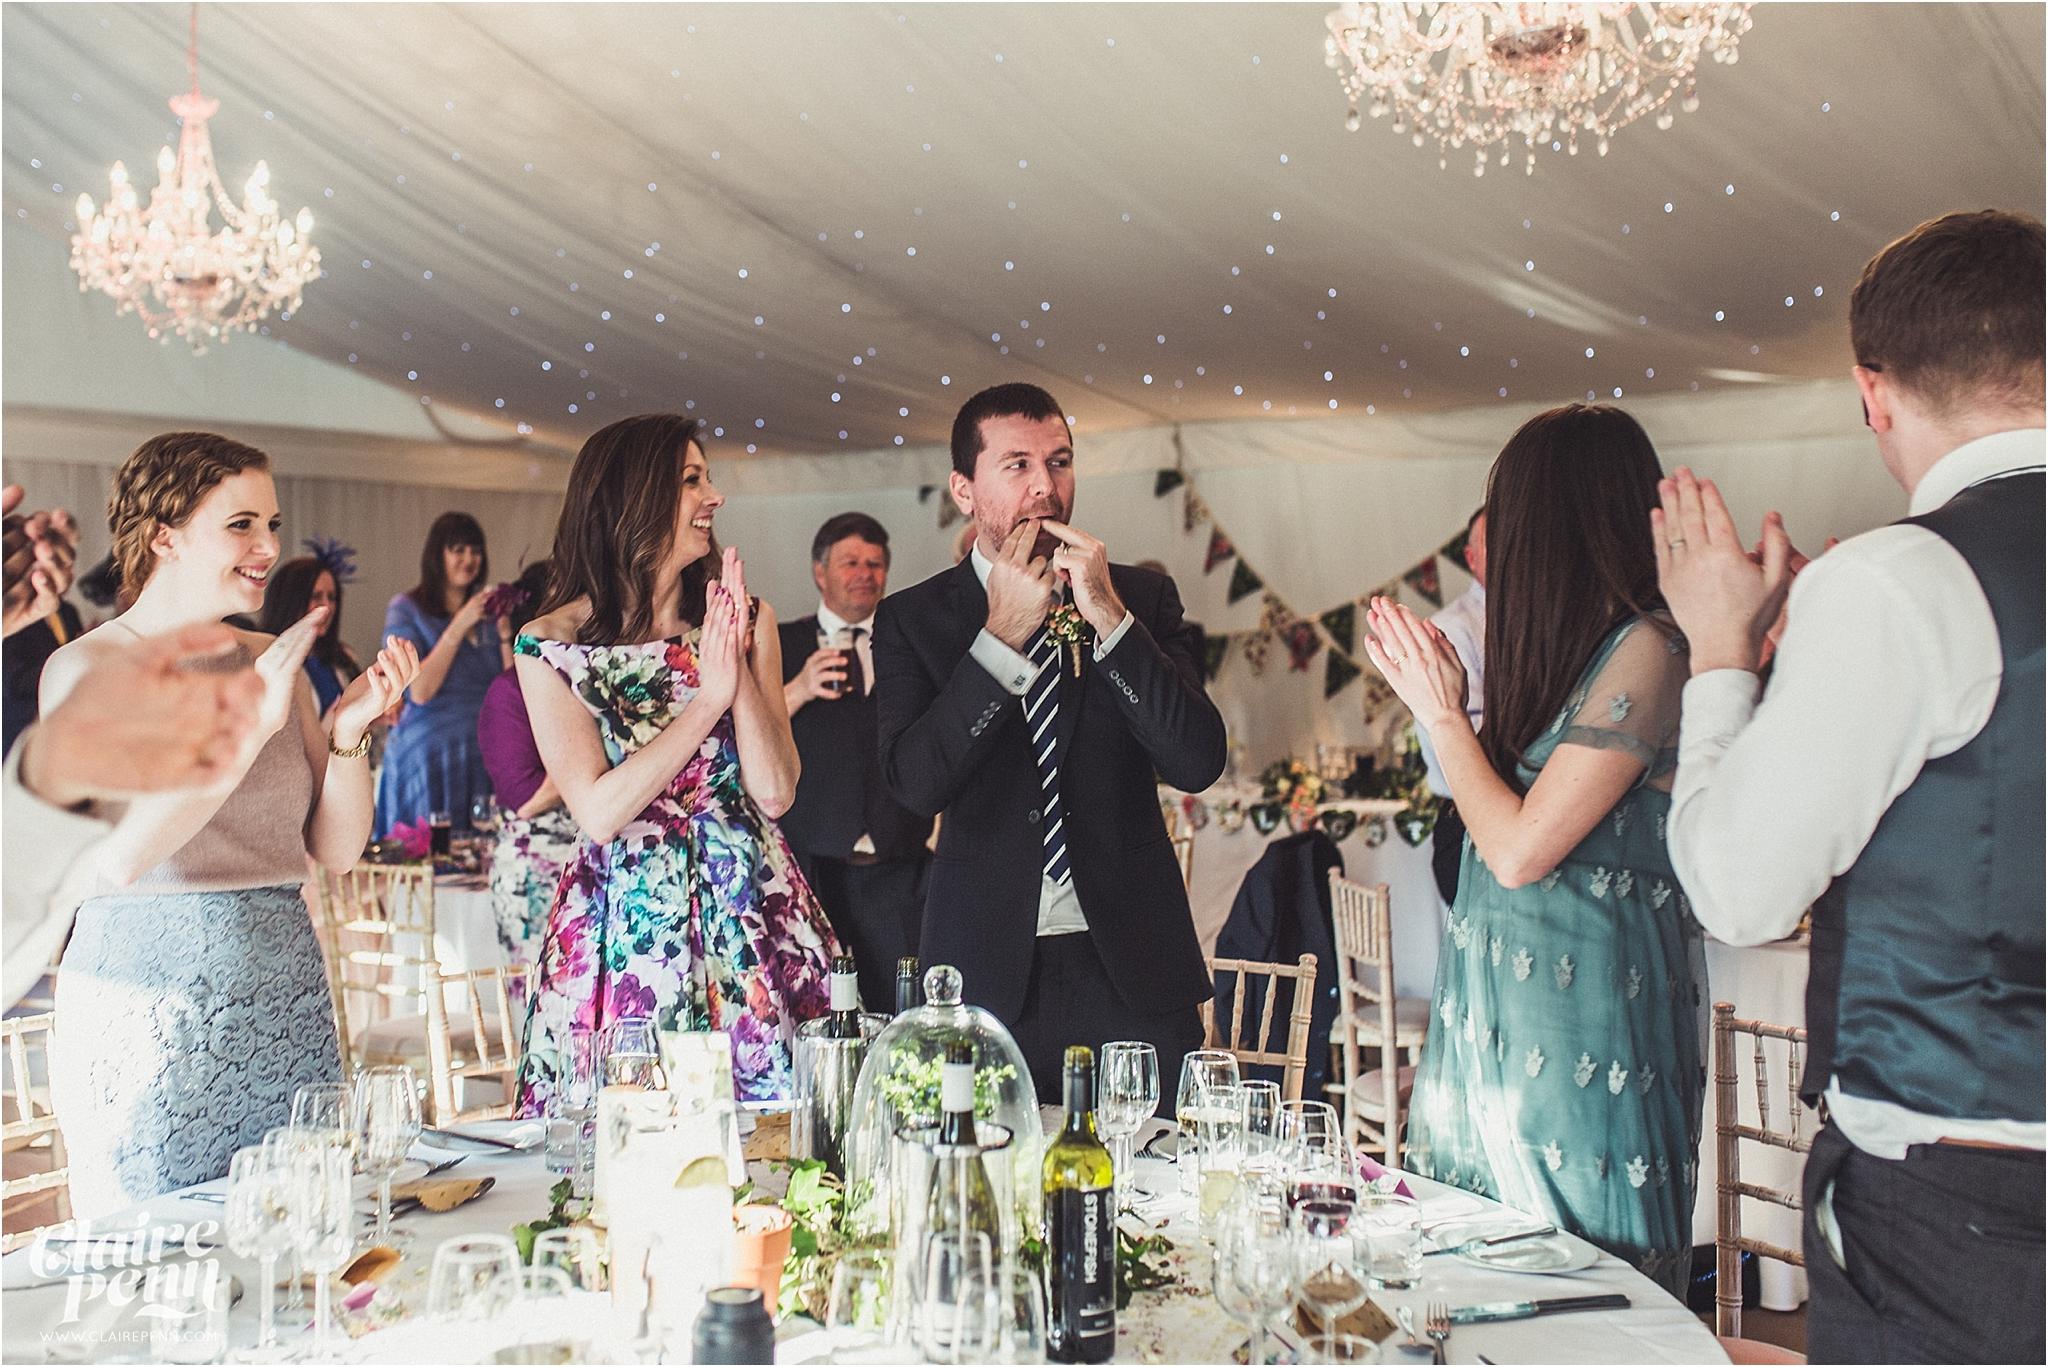 Iscoyd Park wedding, Whitchurch, Cheshire wedding photographer_0051.jpg